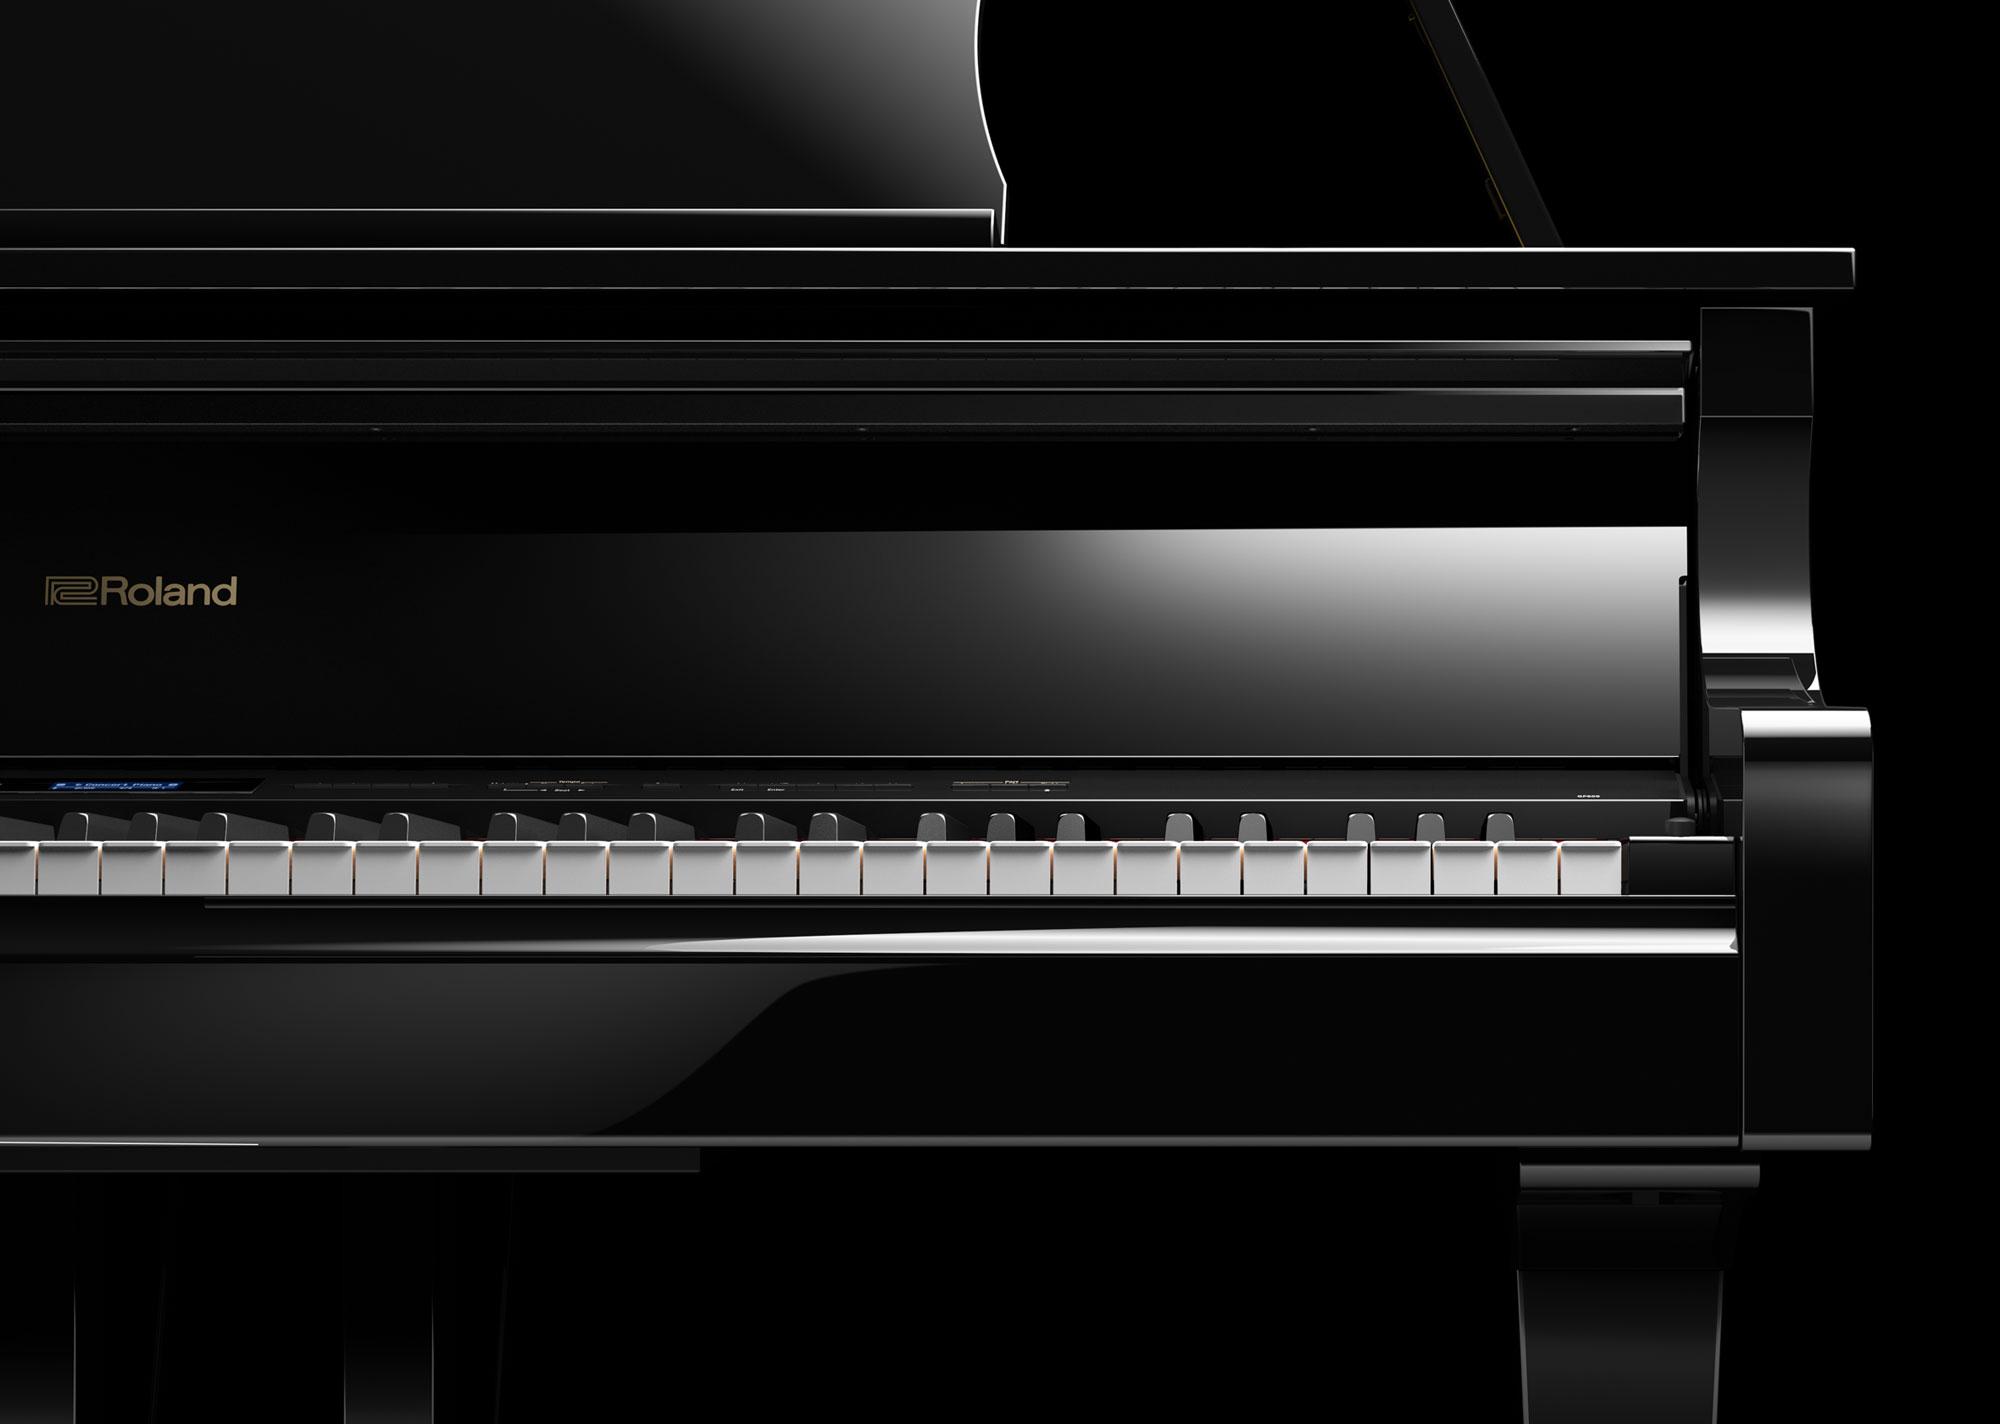 Roland GP-609 Baby Grand Digital Piano - Capital Music